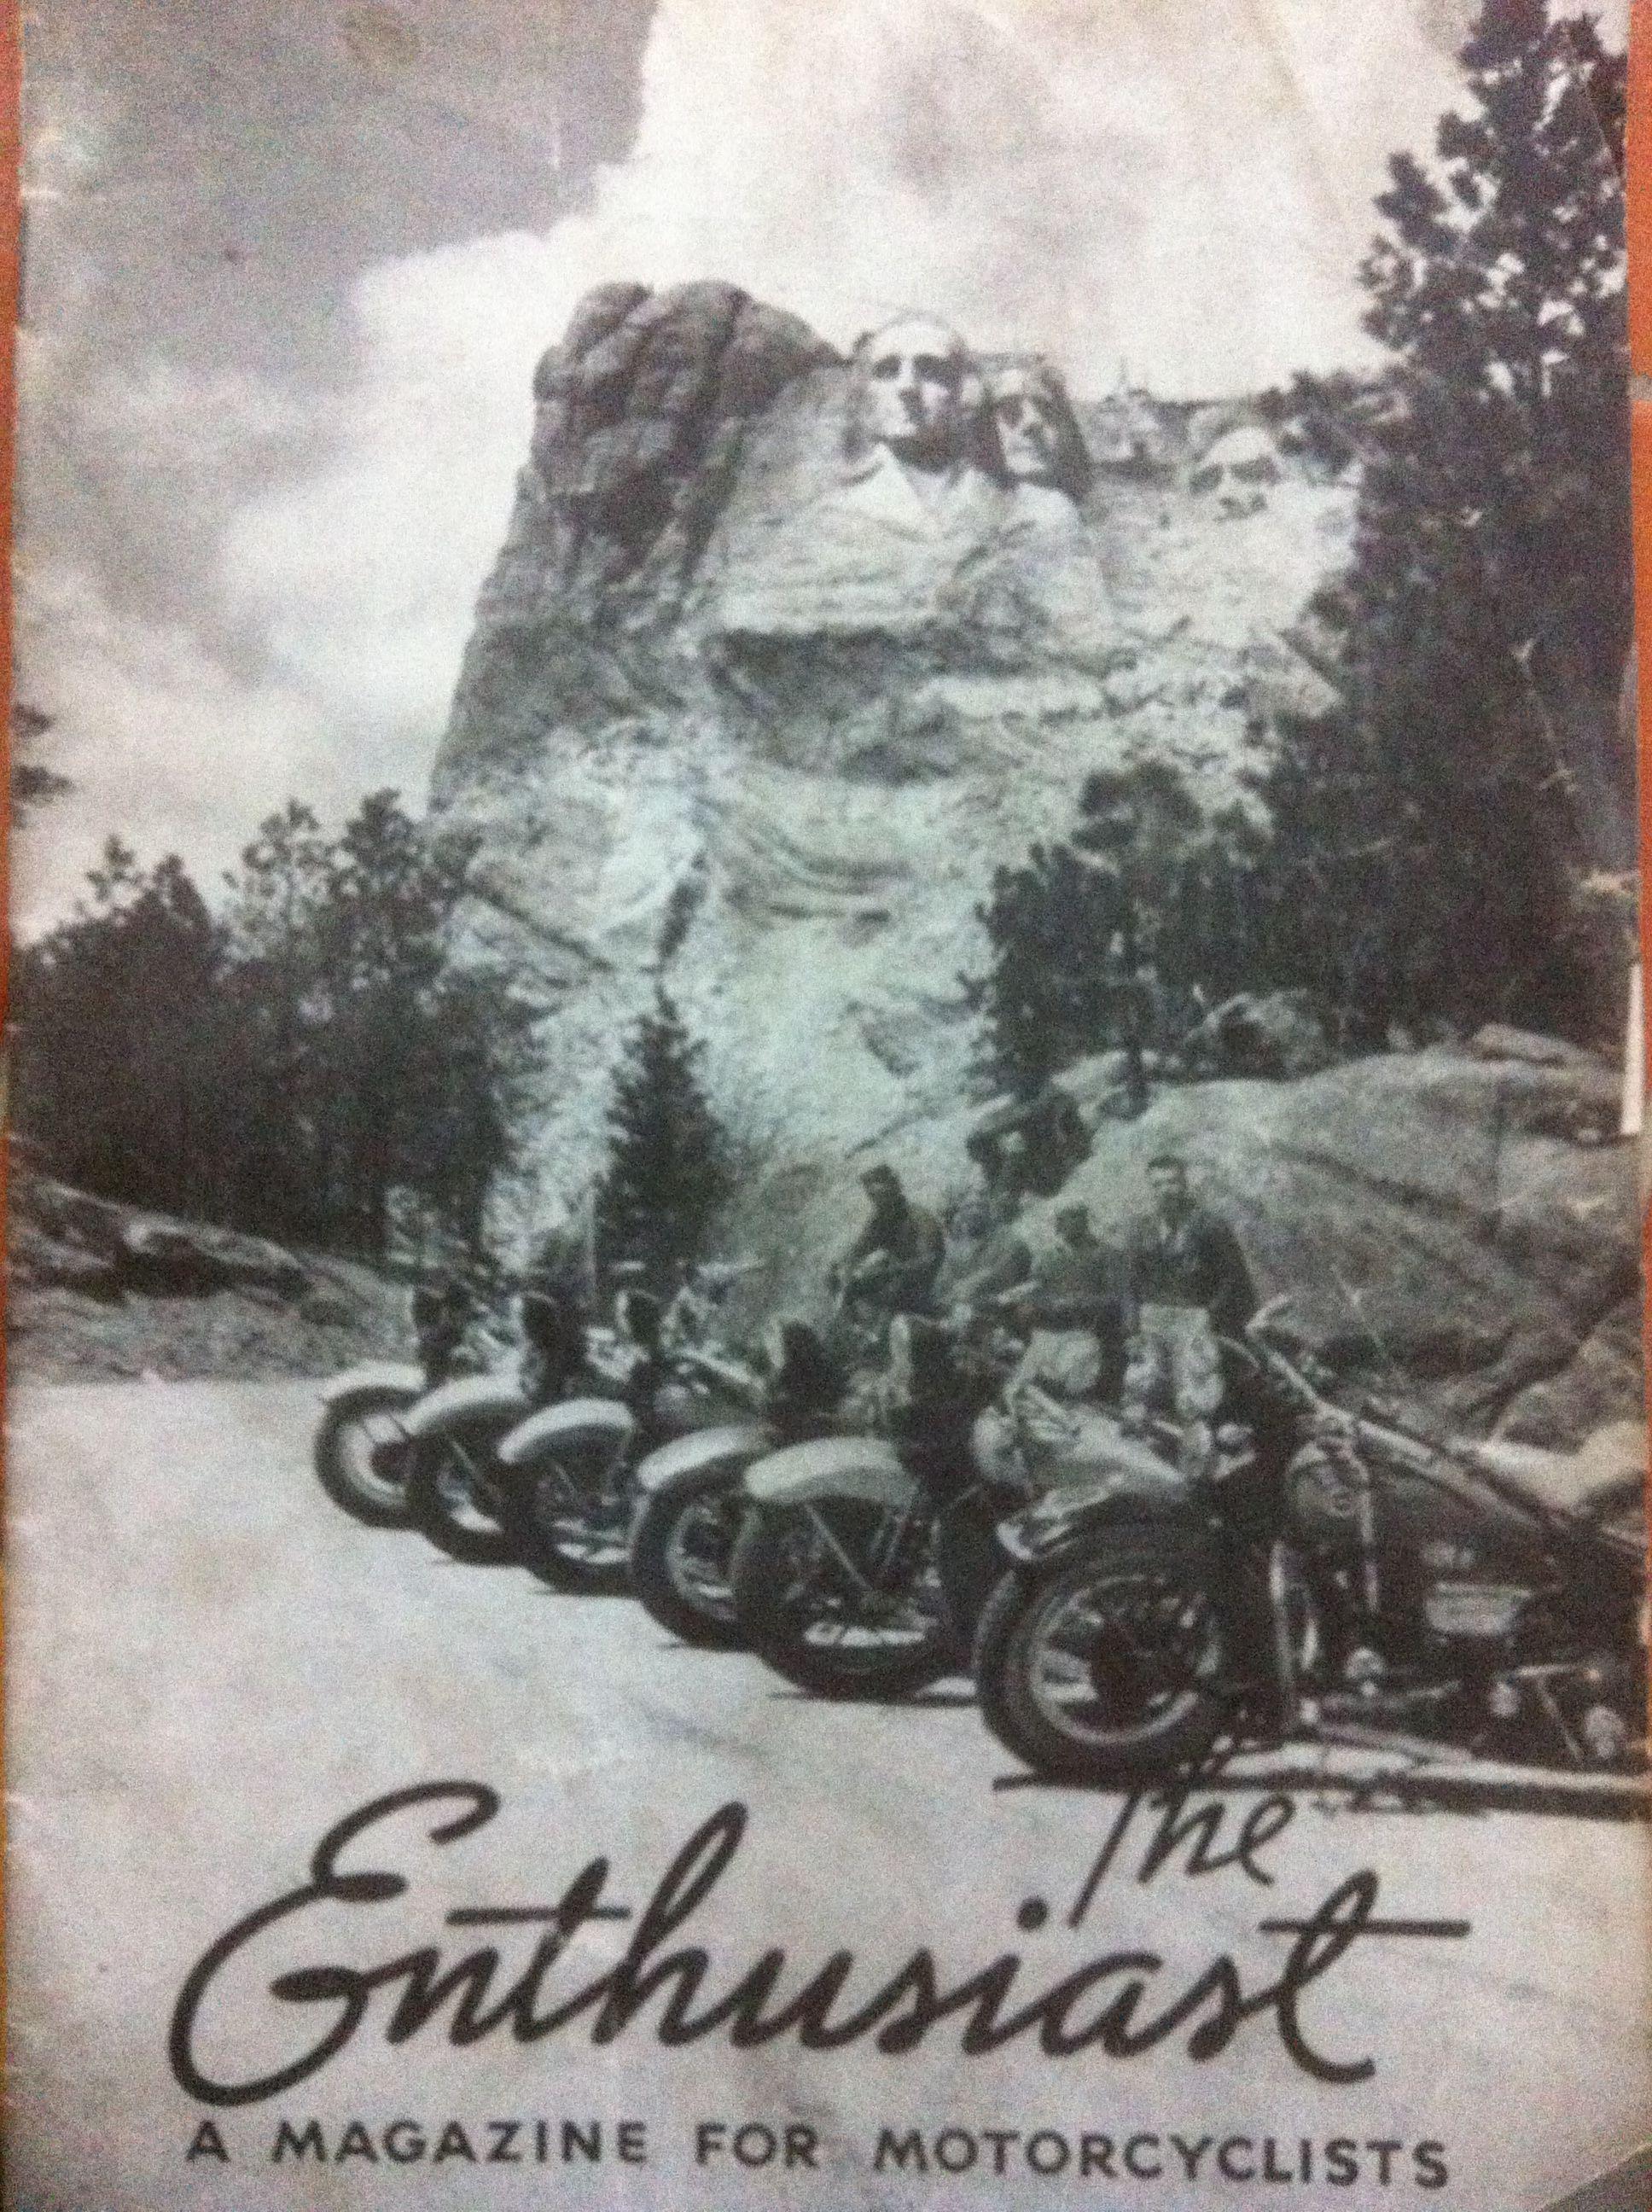 Harley Davidson - The Enthusiast 1938